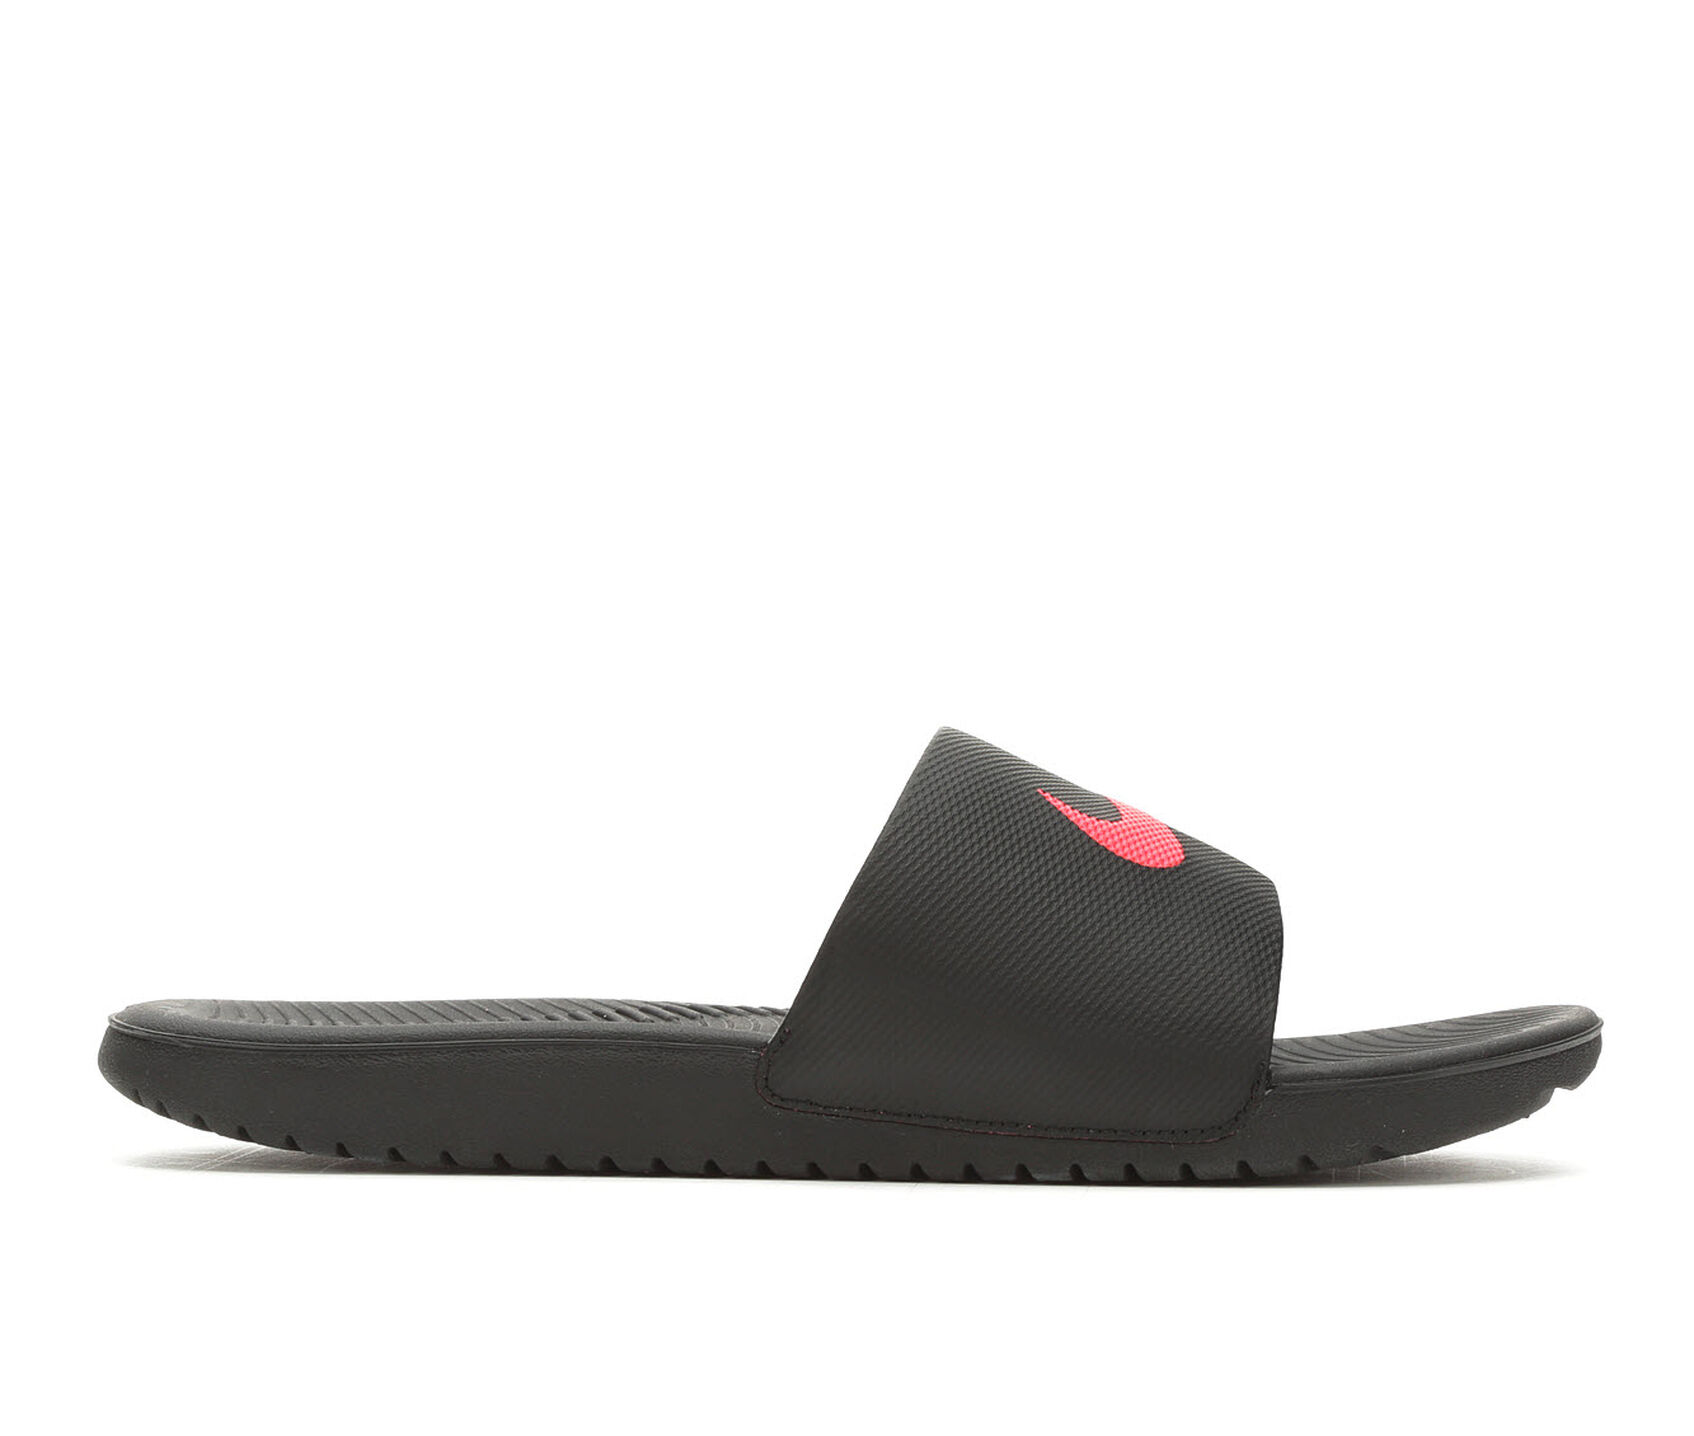 8459514050c4 Men s Nike Kawa Slide Sport Slides